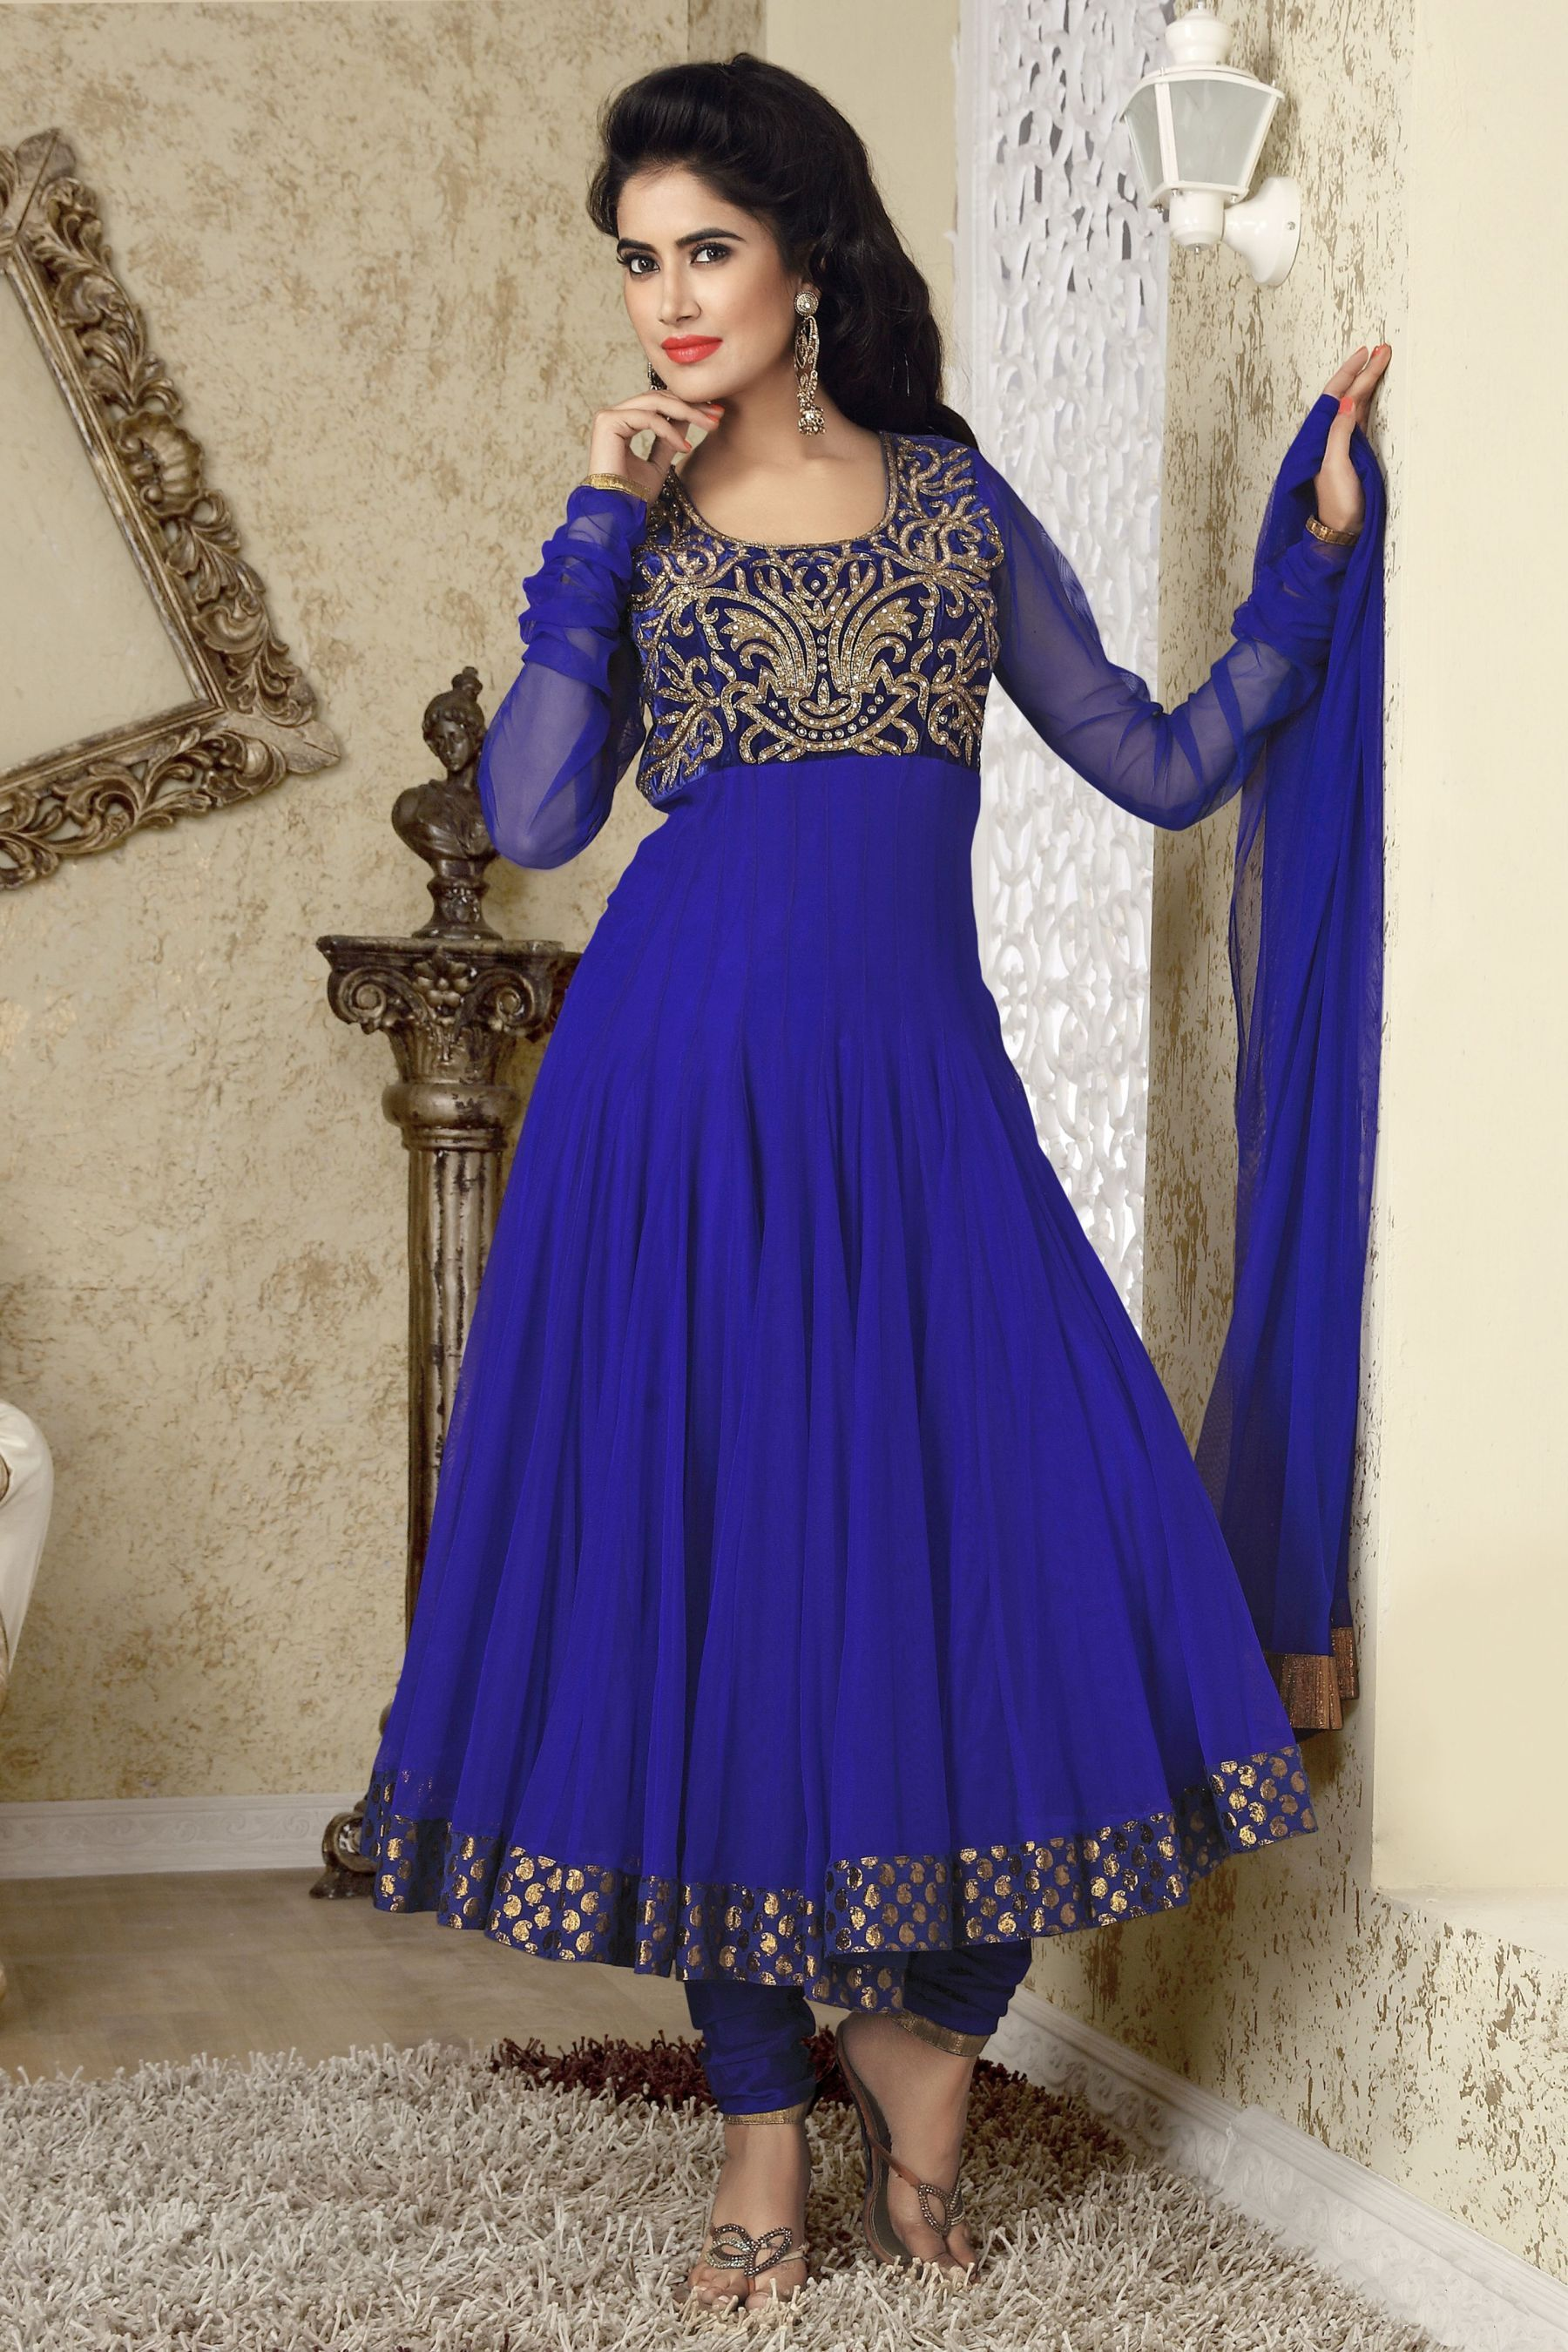 Latest Anarkali Dresses Designs 2014-15 For Eid-Ul-Azha 3 | HOW TO ...